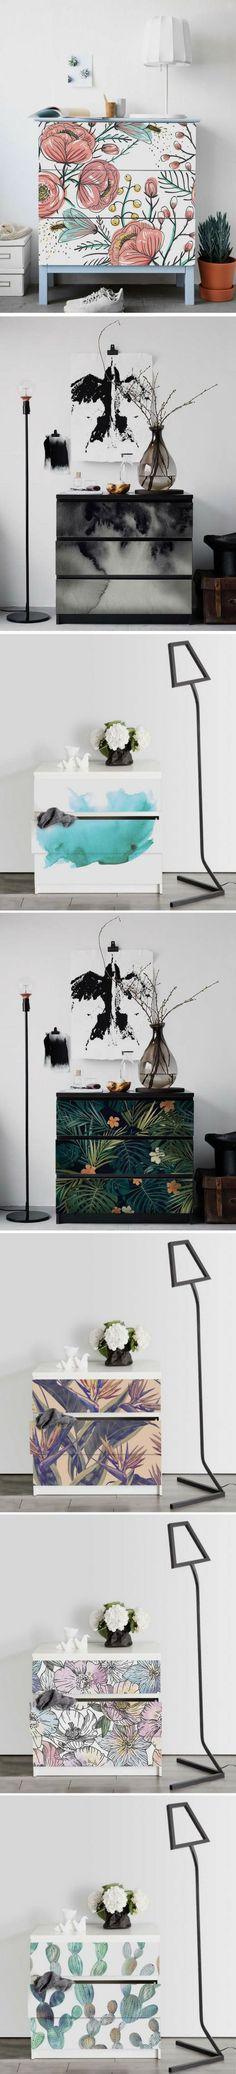 Relooker et personnaliser une commode MALM IKEA avec des stickers ! #ikeahack #ikeamalm #diy #interiordecoration #interiordesign